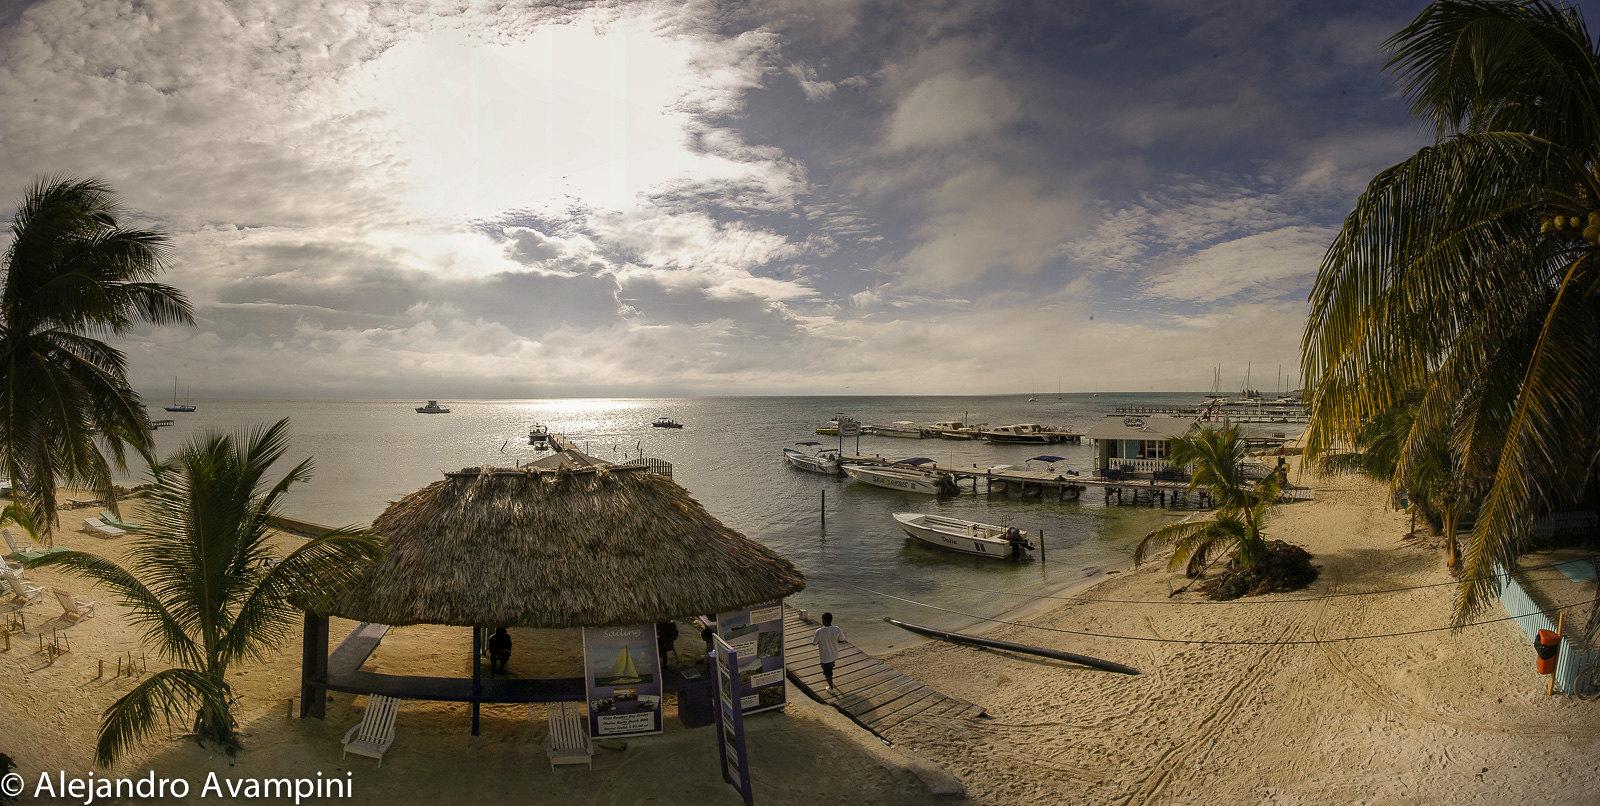 Atardecer en la Playa de Ambergris - Belice